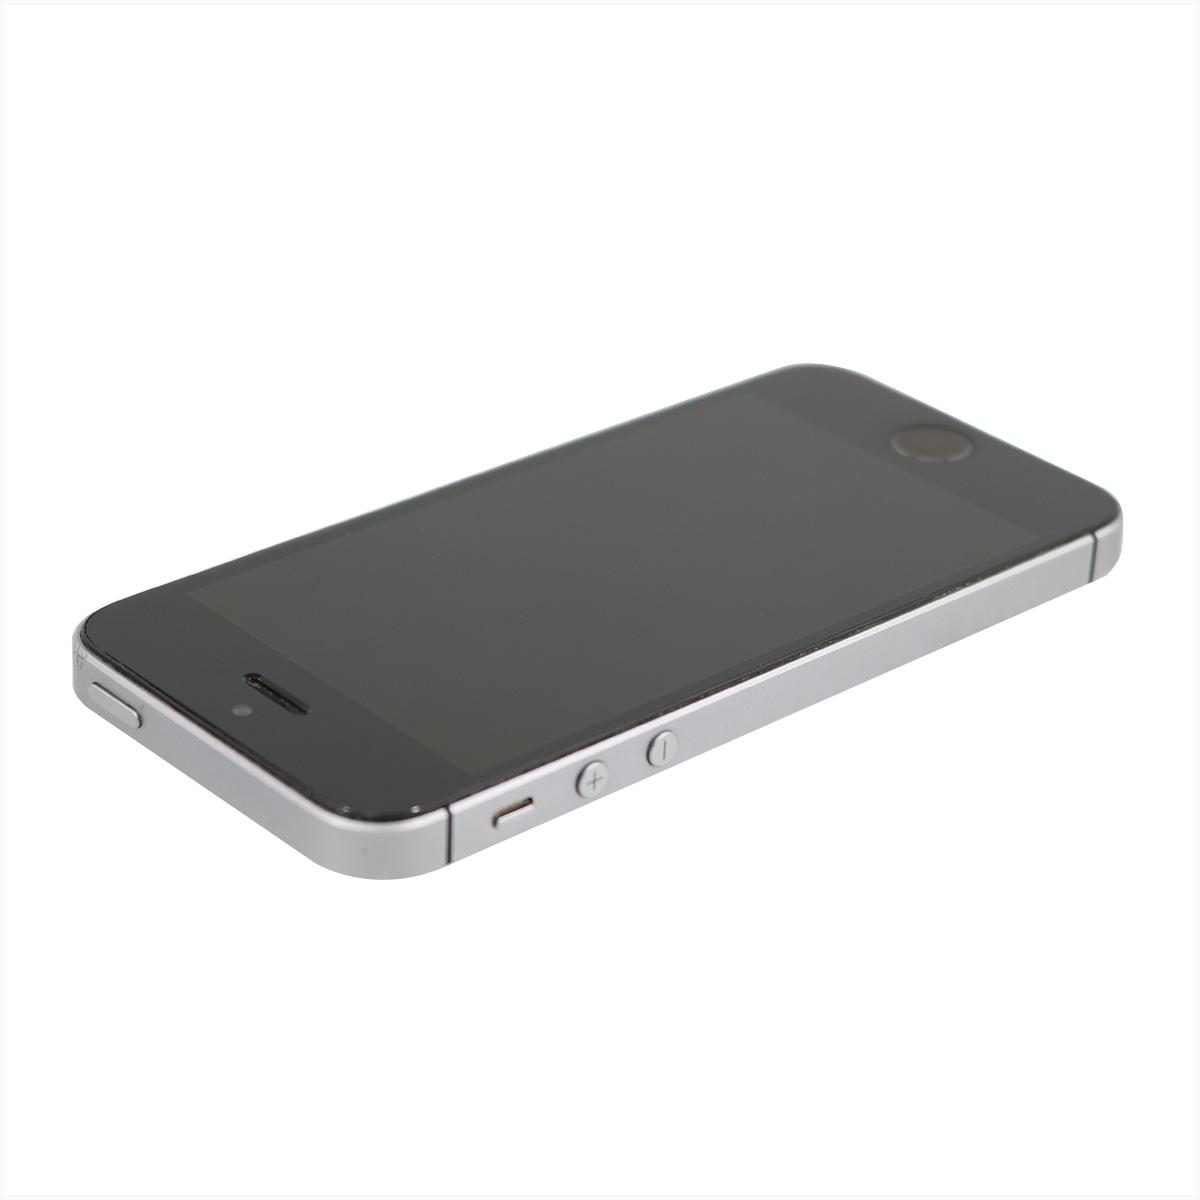 Iphone SE Apple A1723 64gb - Usado